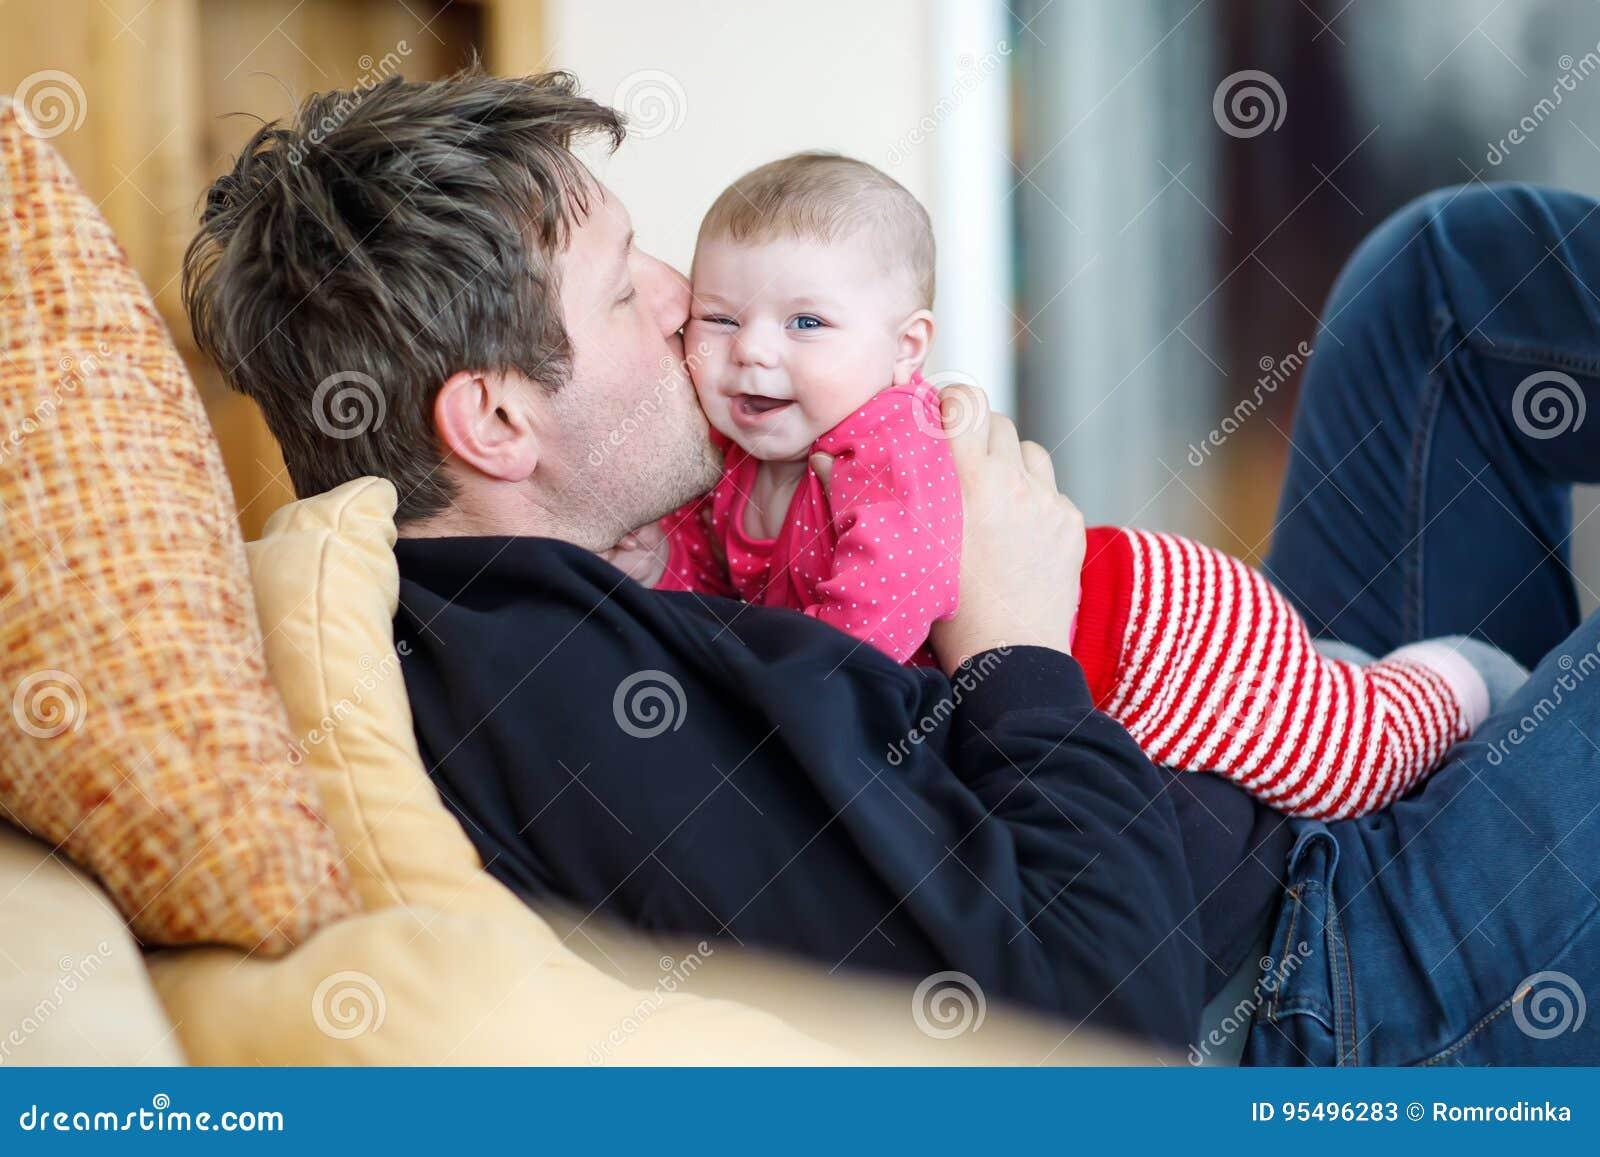 Step Dad Fucks Daughter New